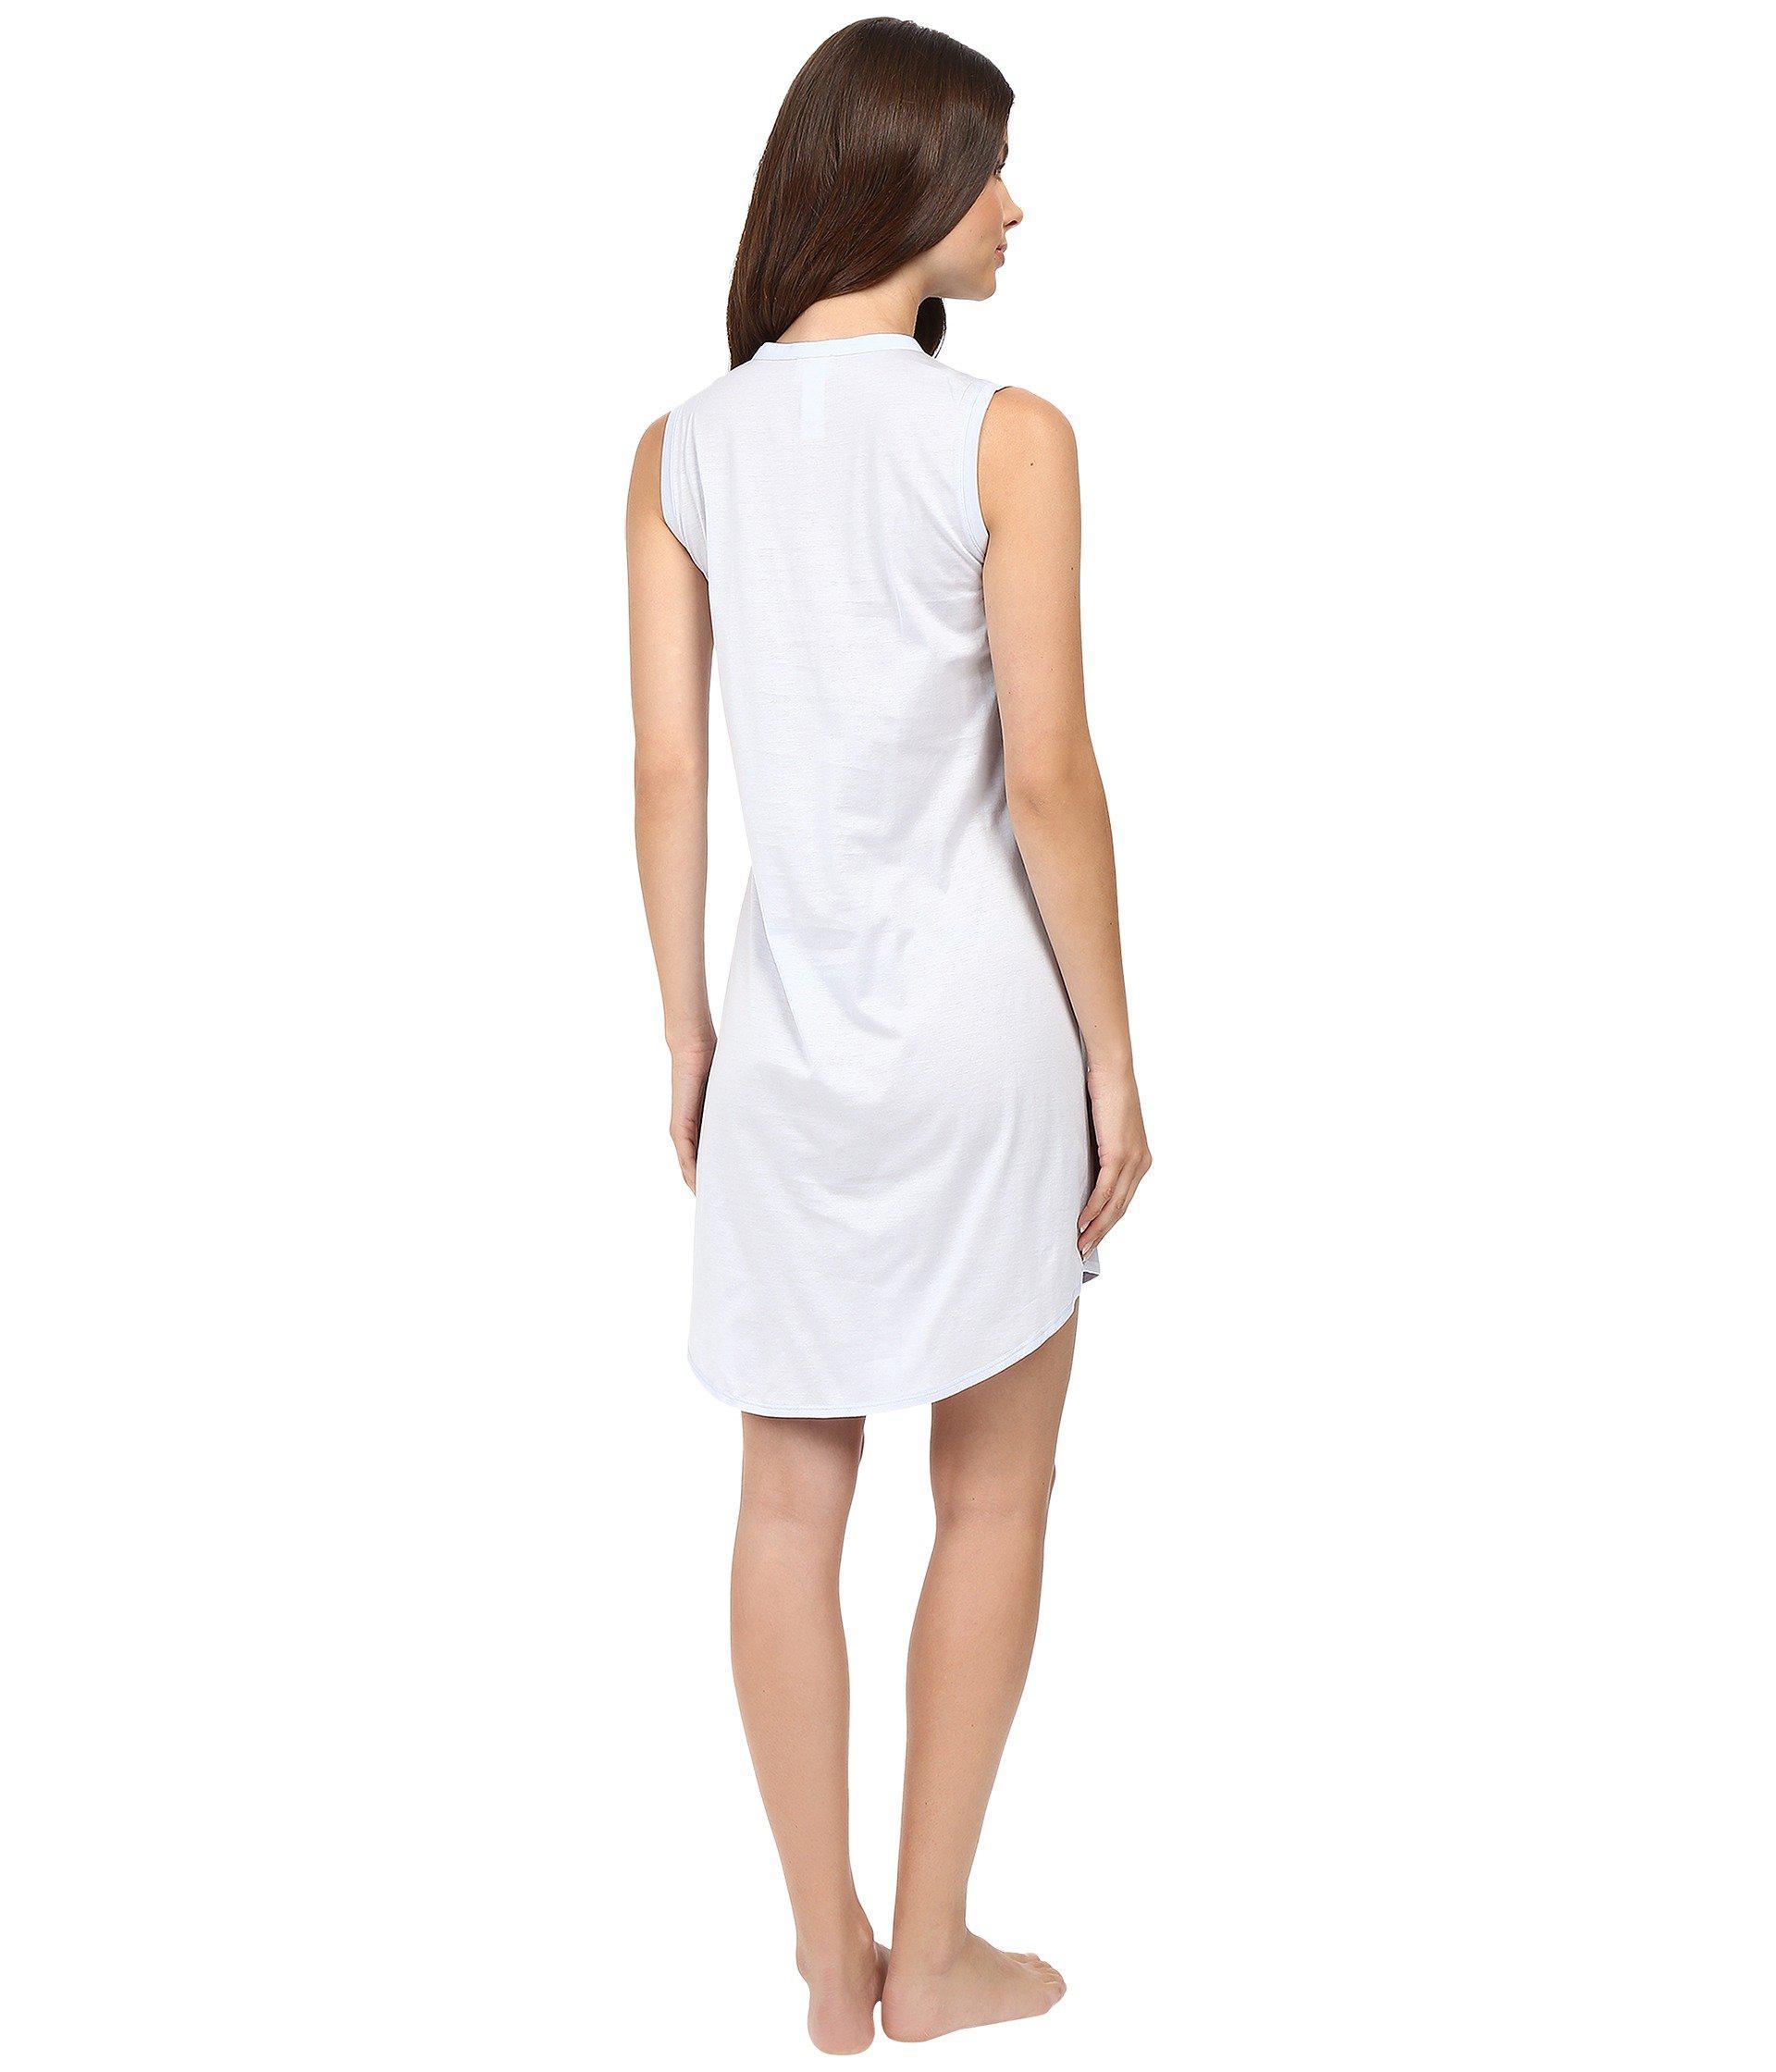 f756279877 Hanro - White Cotton Deluxe Button Front Tank Nightgown (tender Rose)  Women s Pajama -. View fullscreen